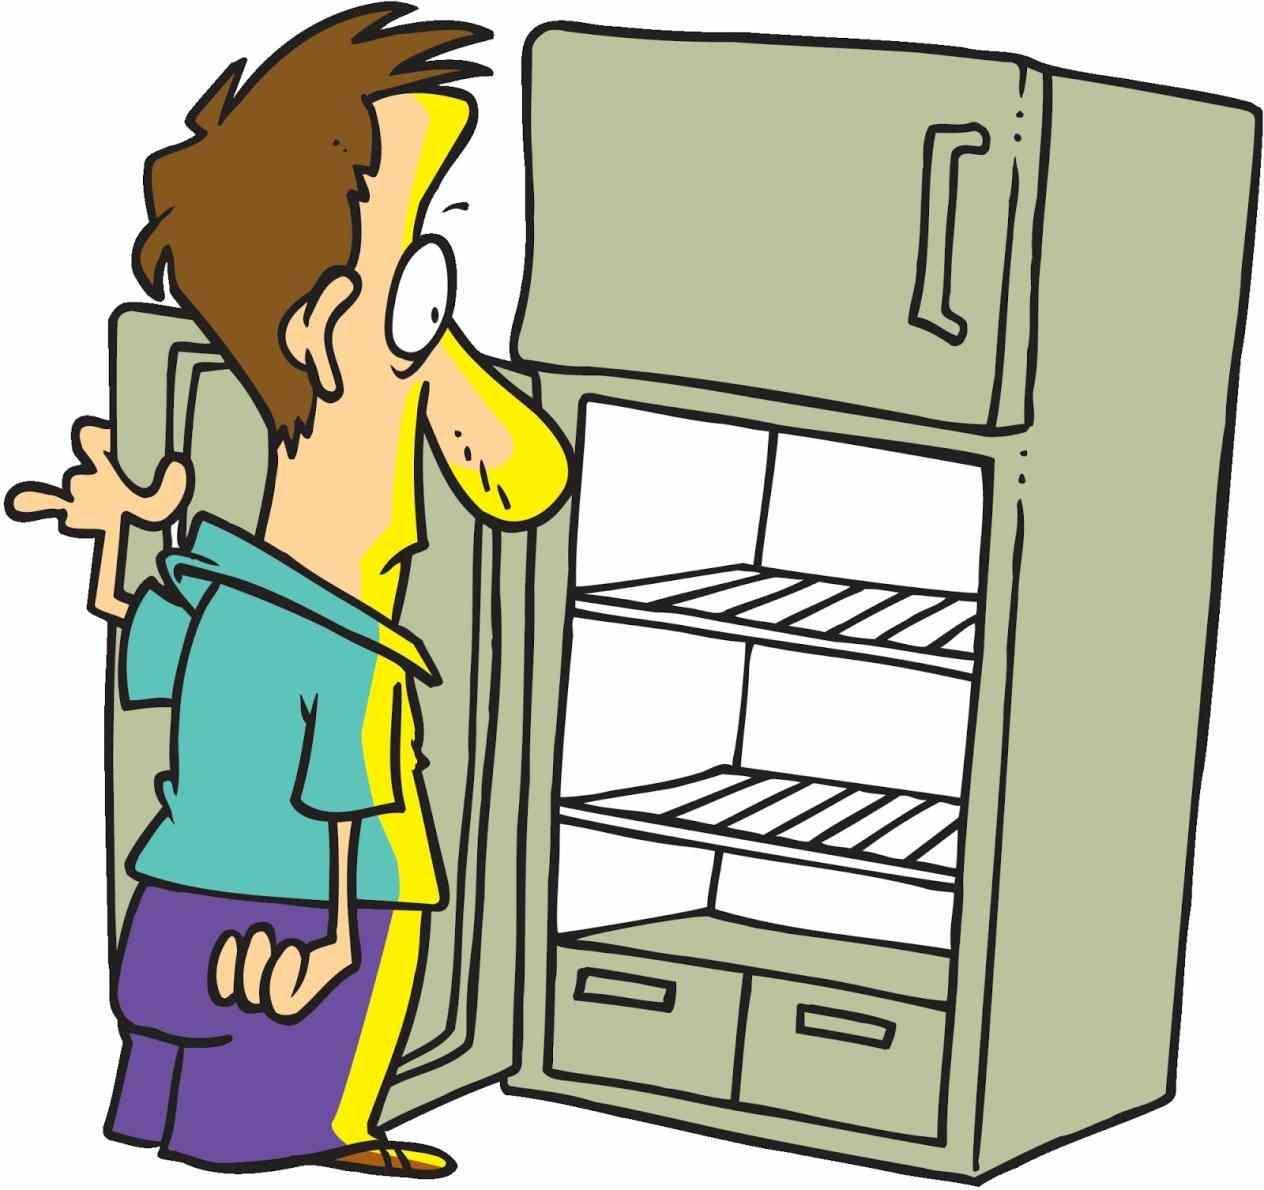 svg transparent library Refrigerator free download best. Fridge clipart opened